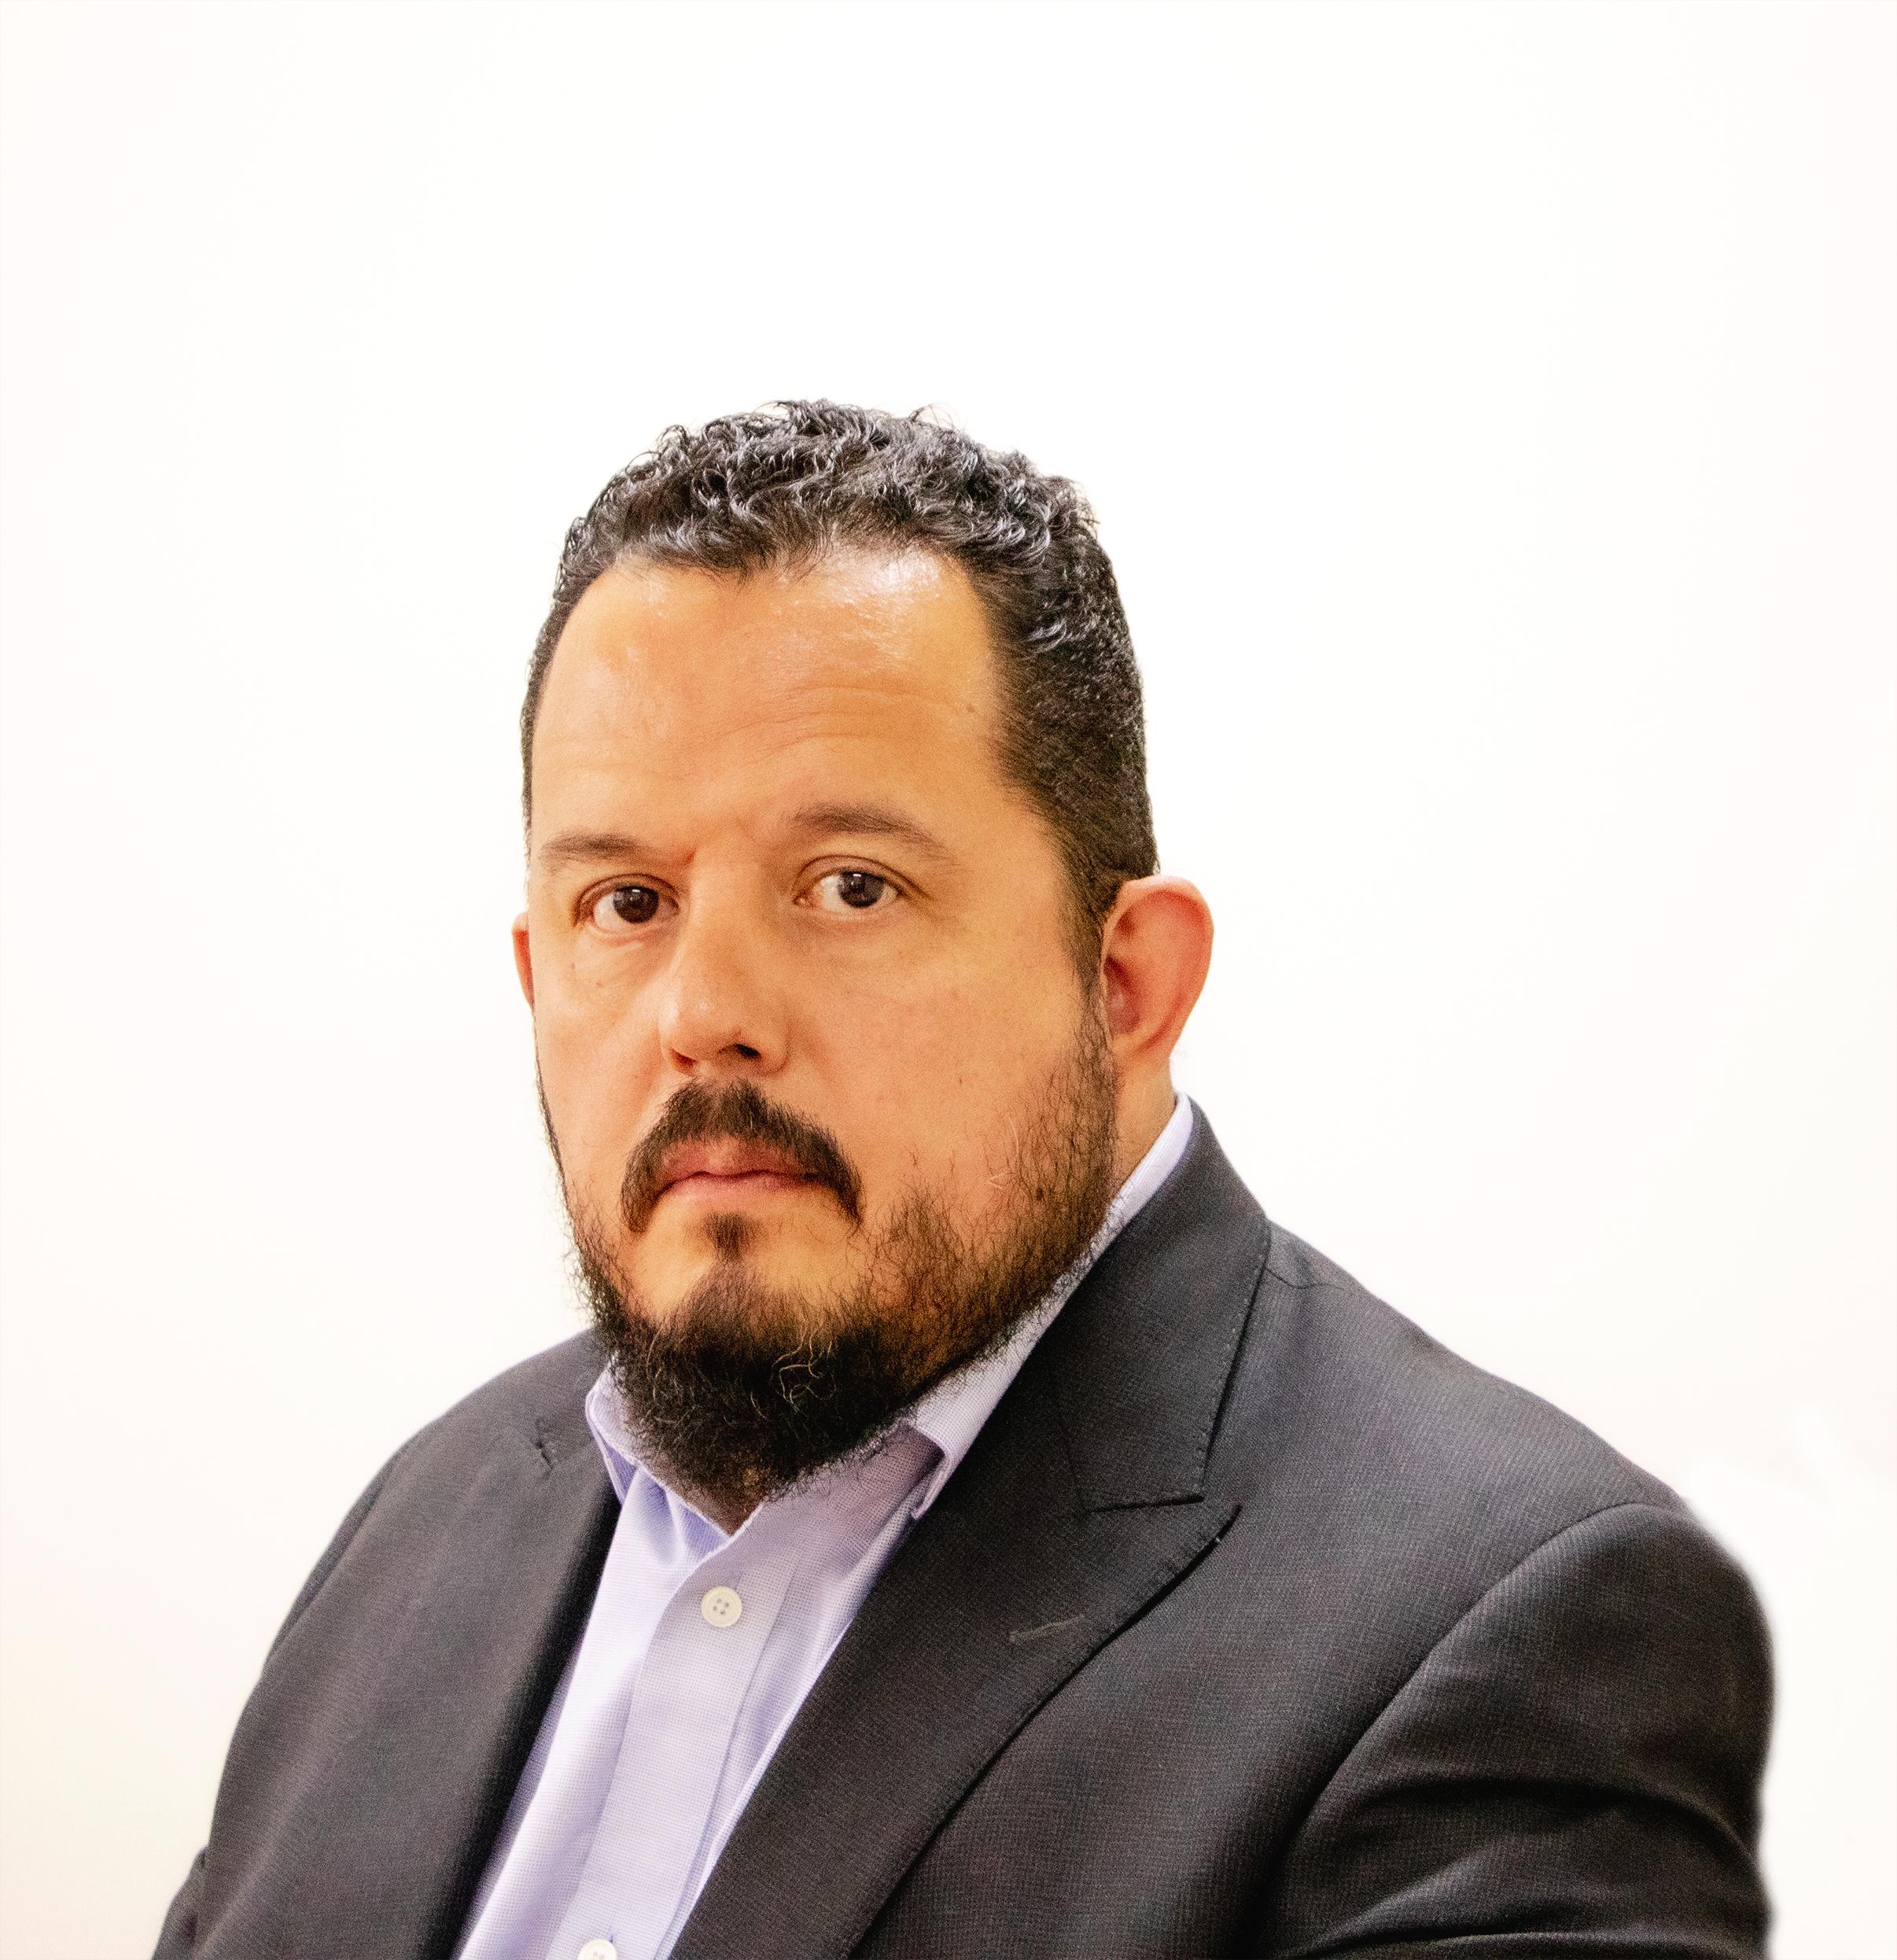 Carlos Pachecho